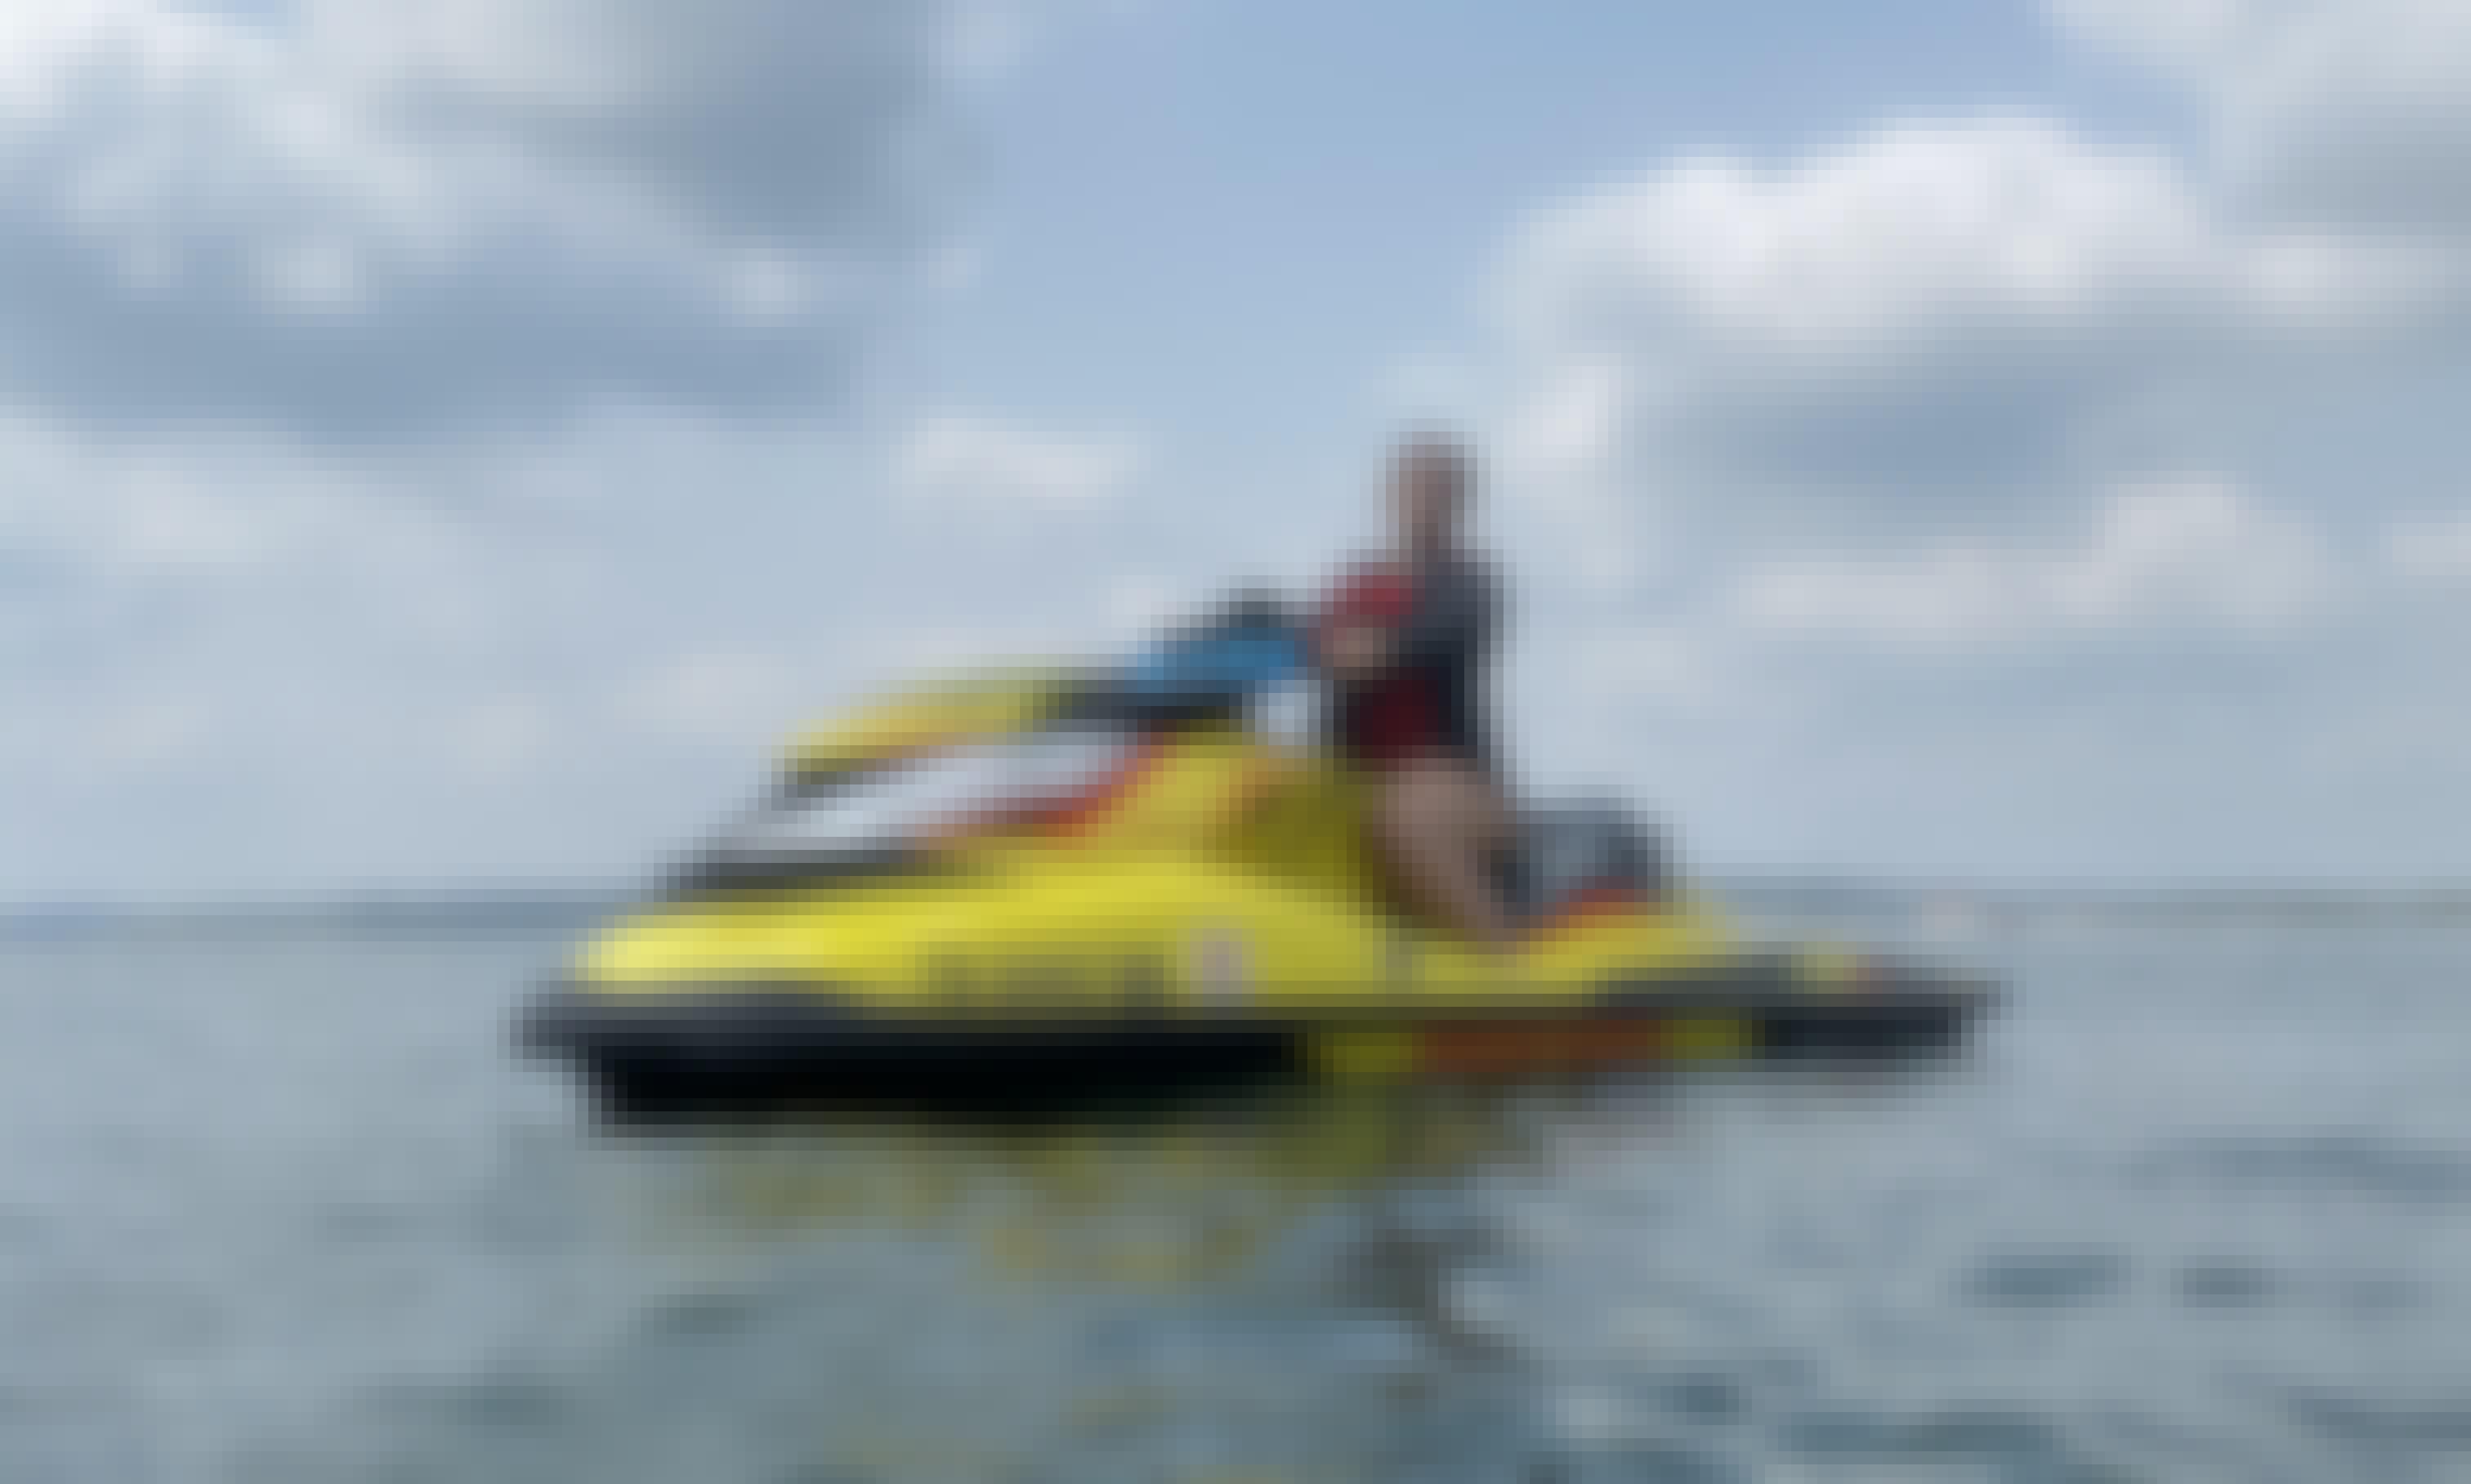 SeaDoo RXP-X Supercharged Jet Ski on Lake Travis and Lake Austin